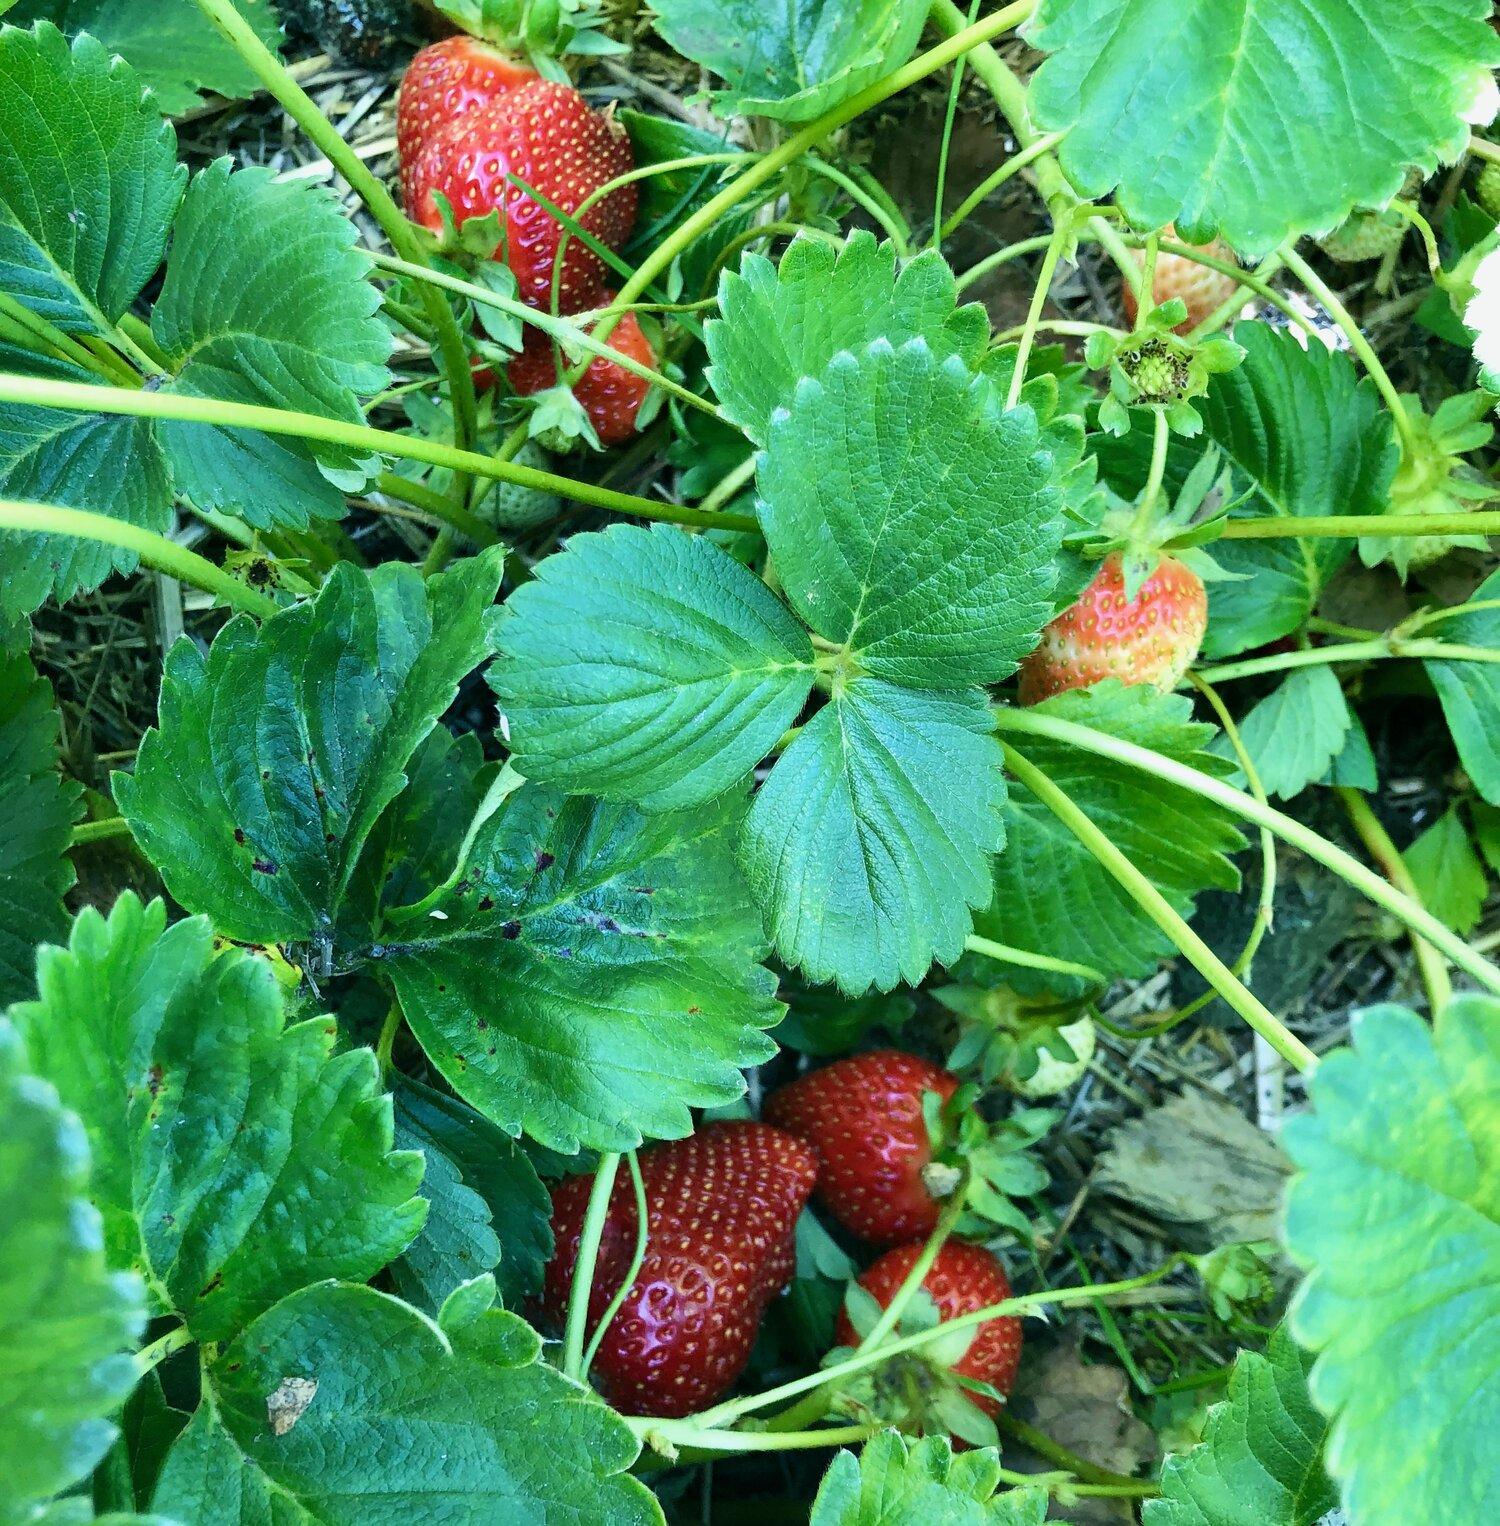 strawberry under leaves.jpeg